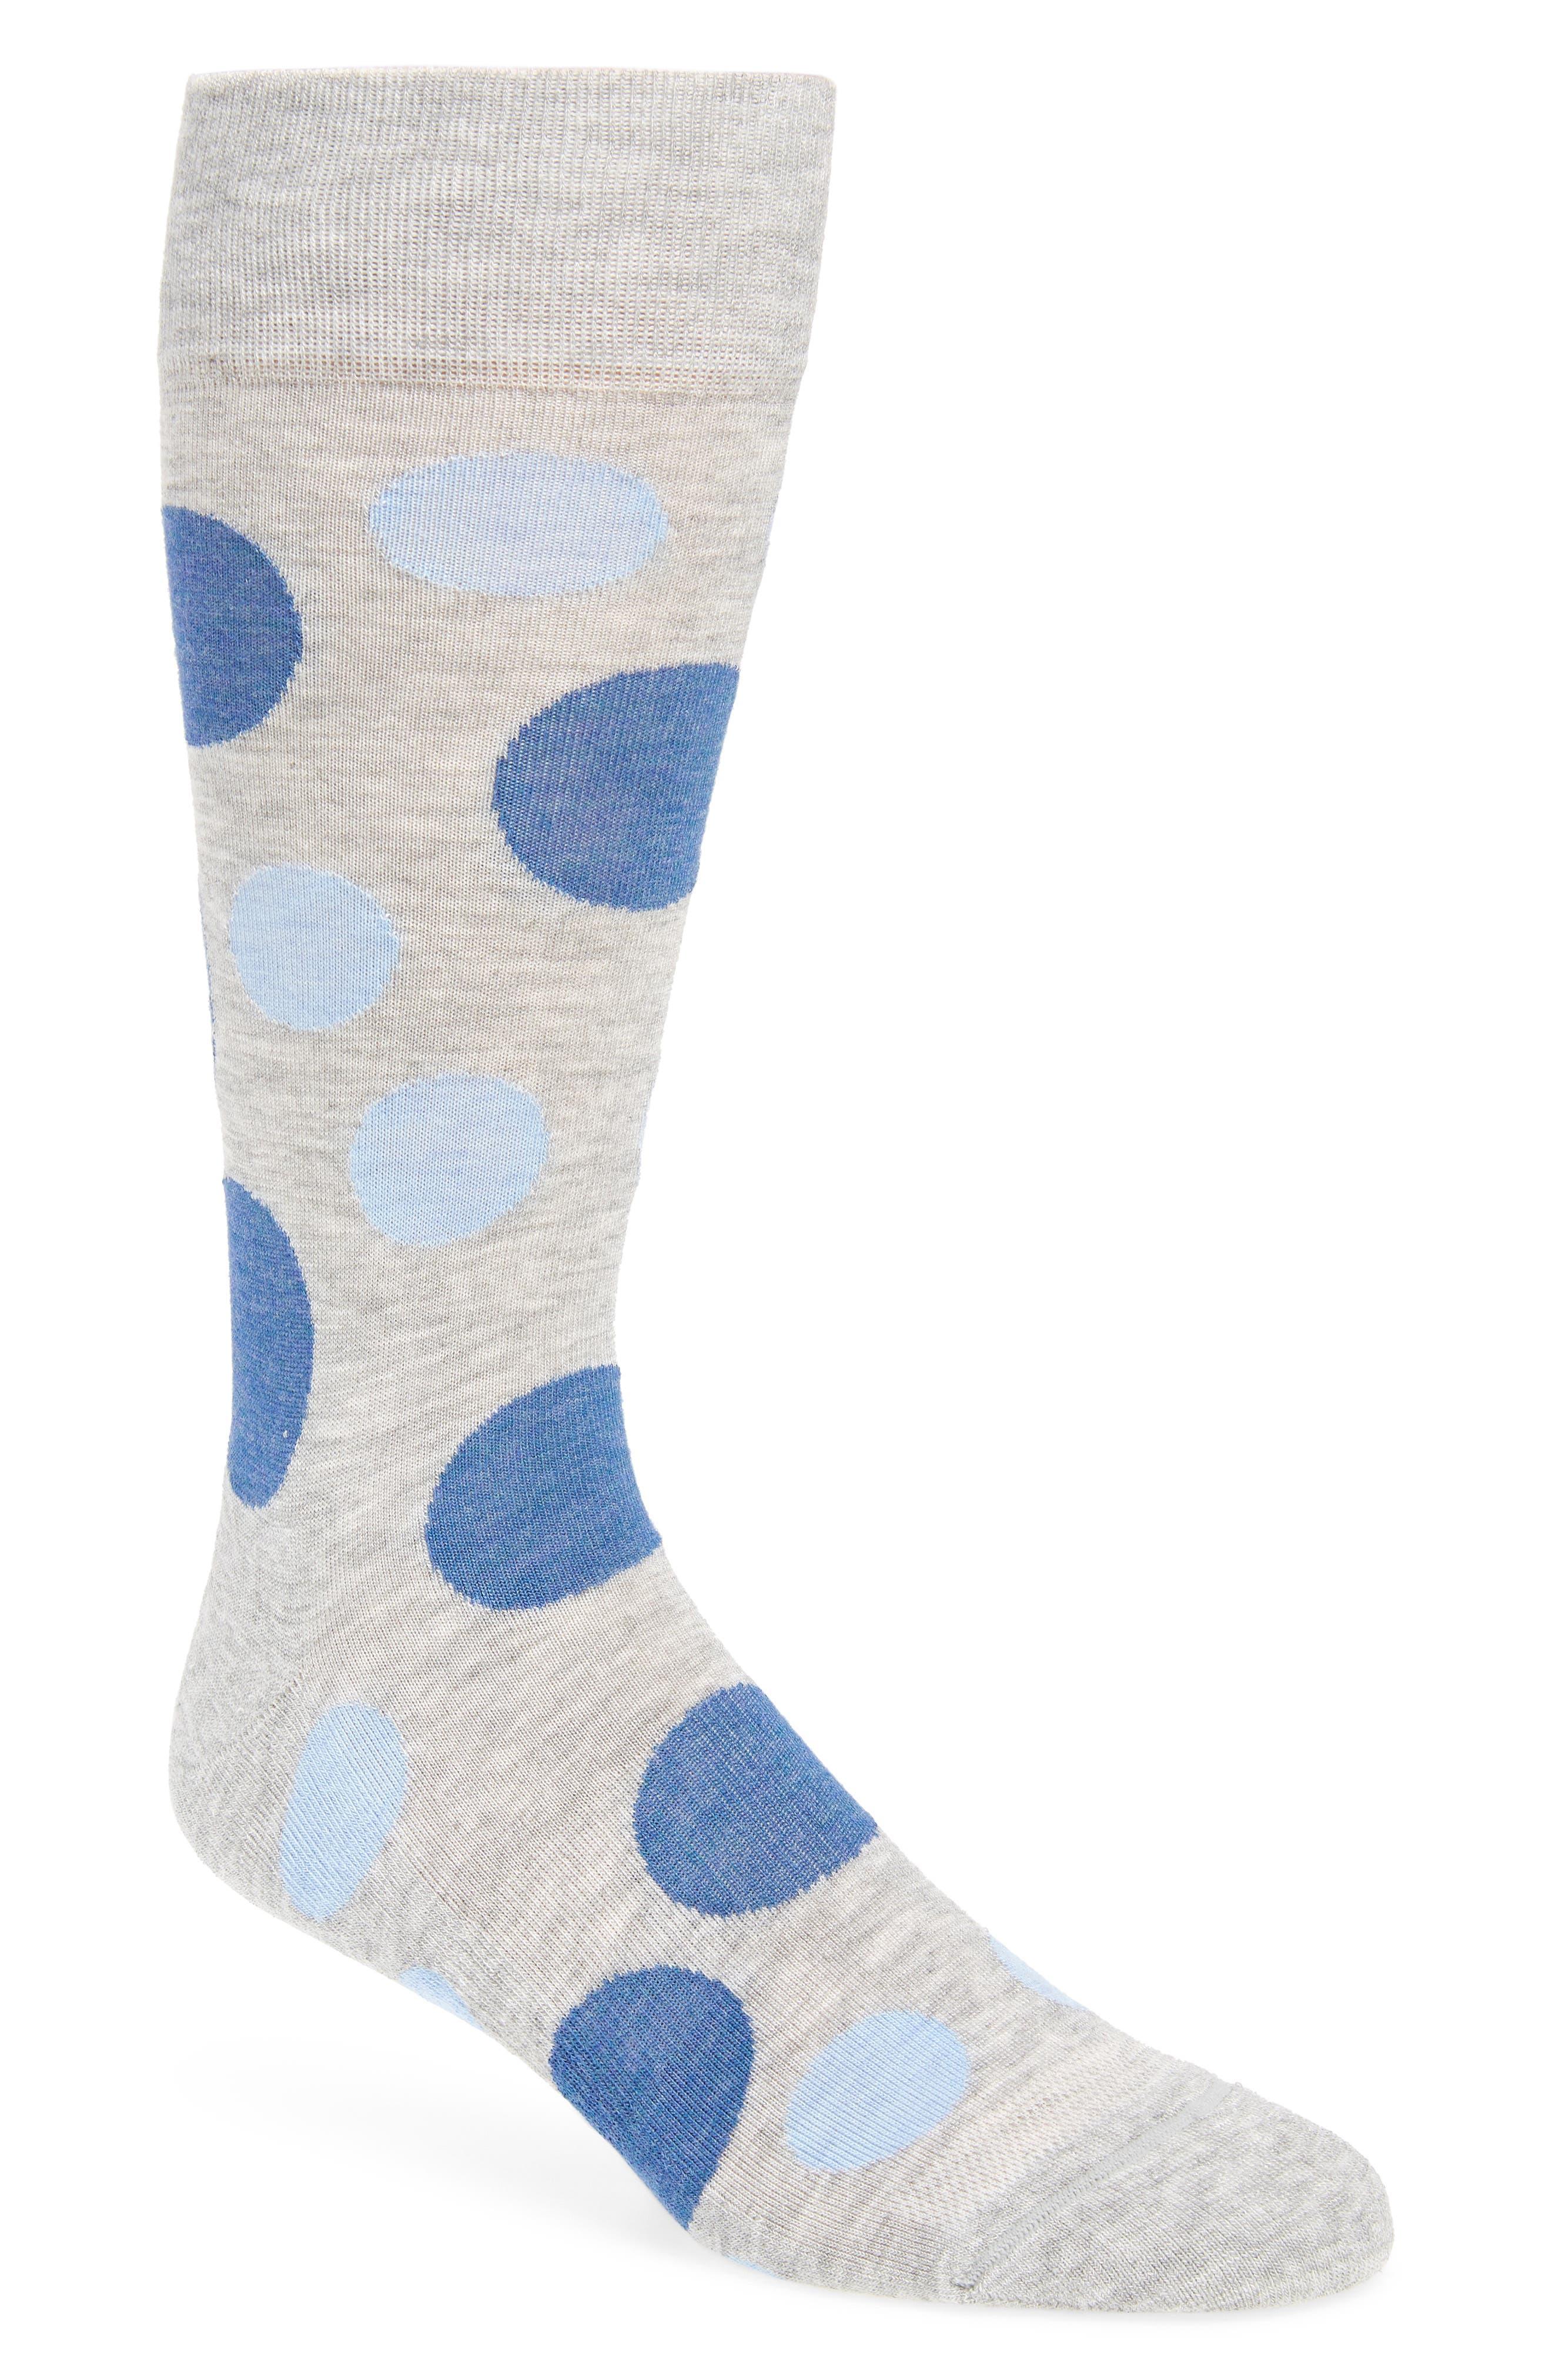 Dot Socks,                             Main thumbnail 1, color,                             Grey/ Blue